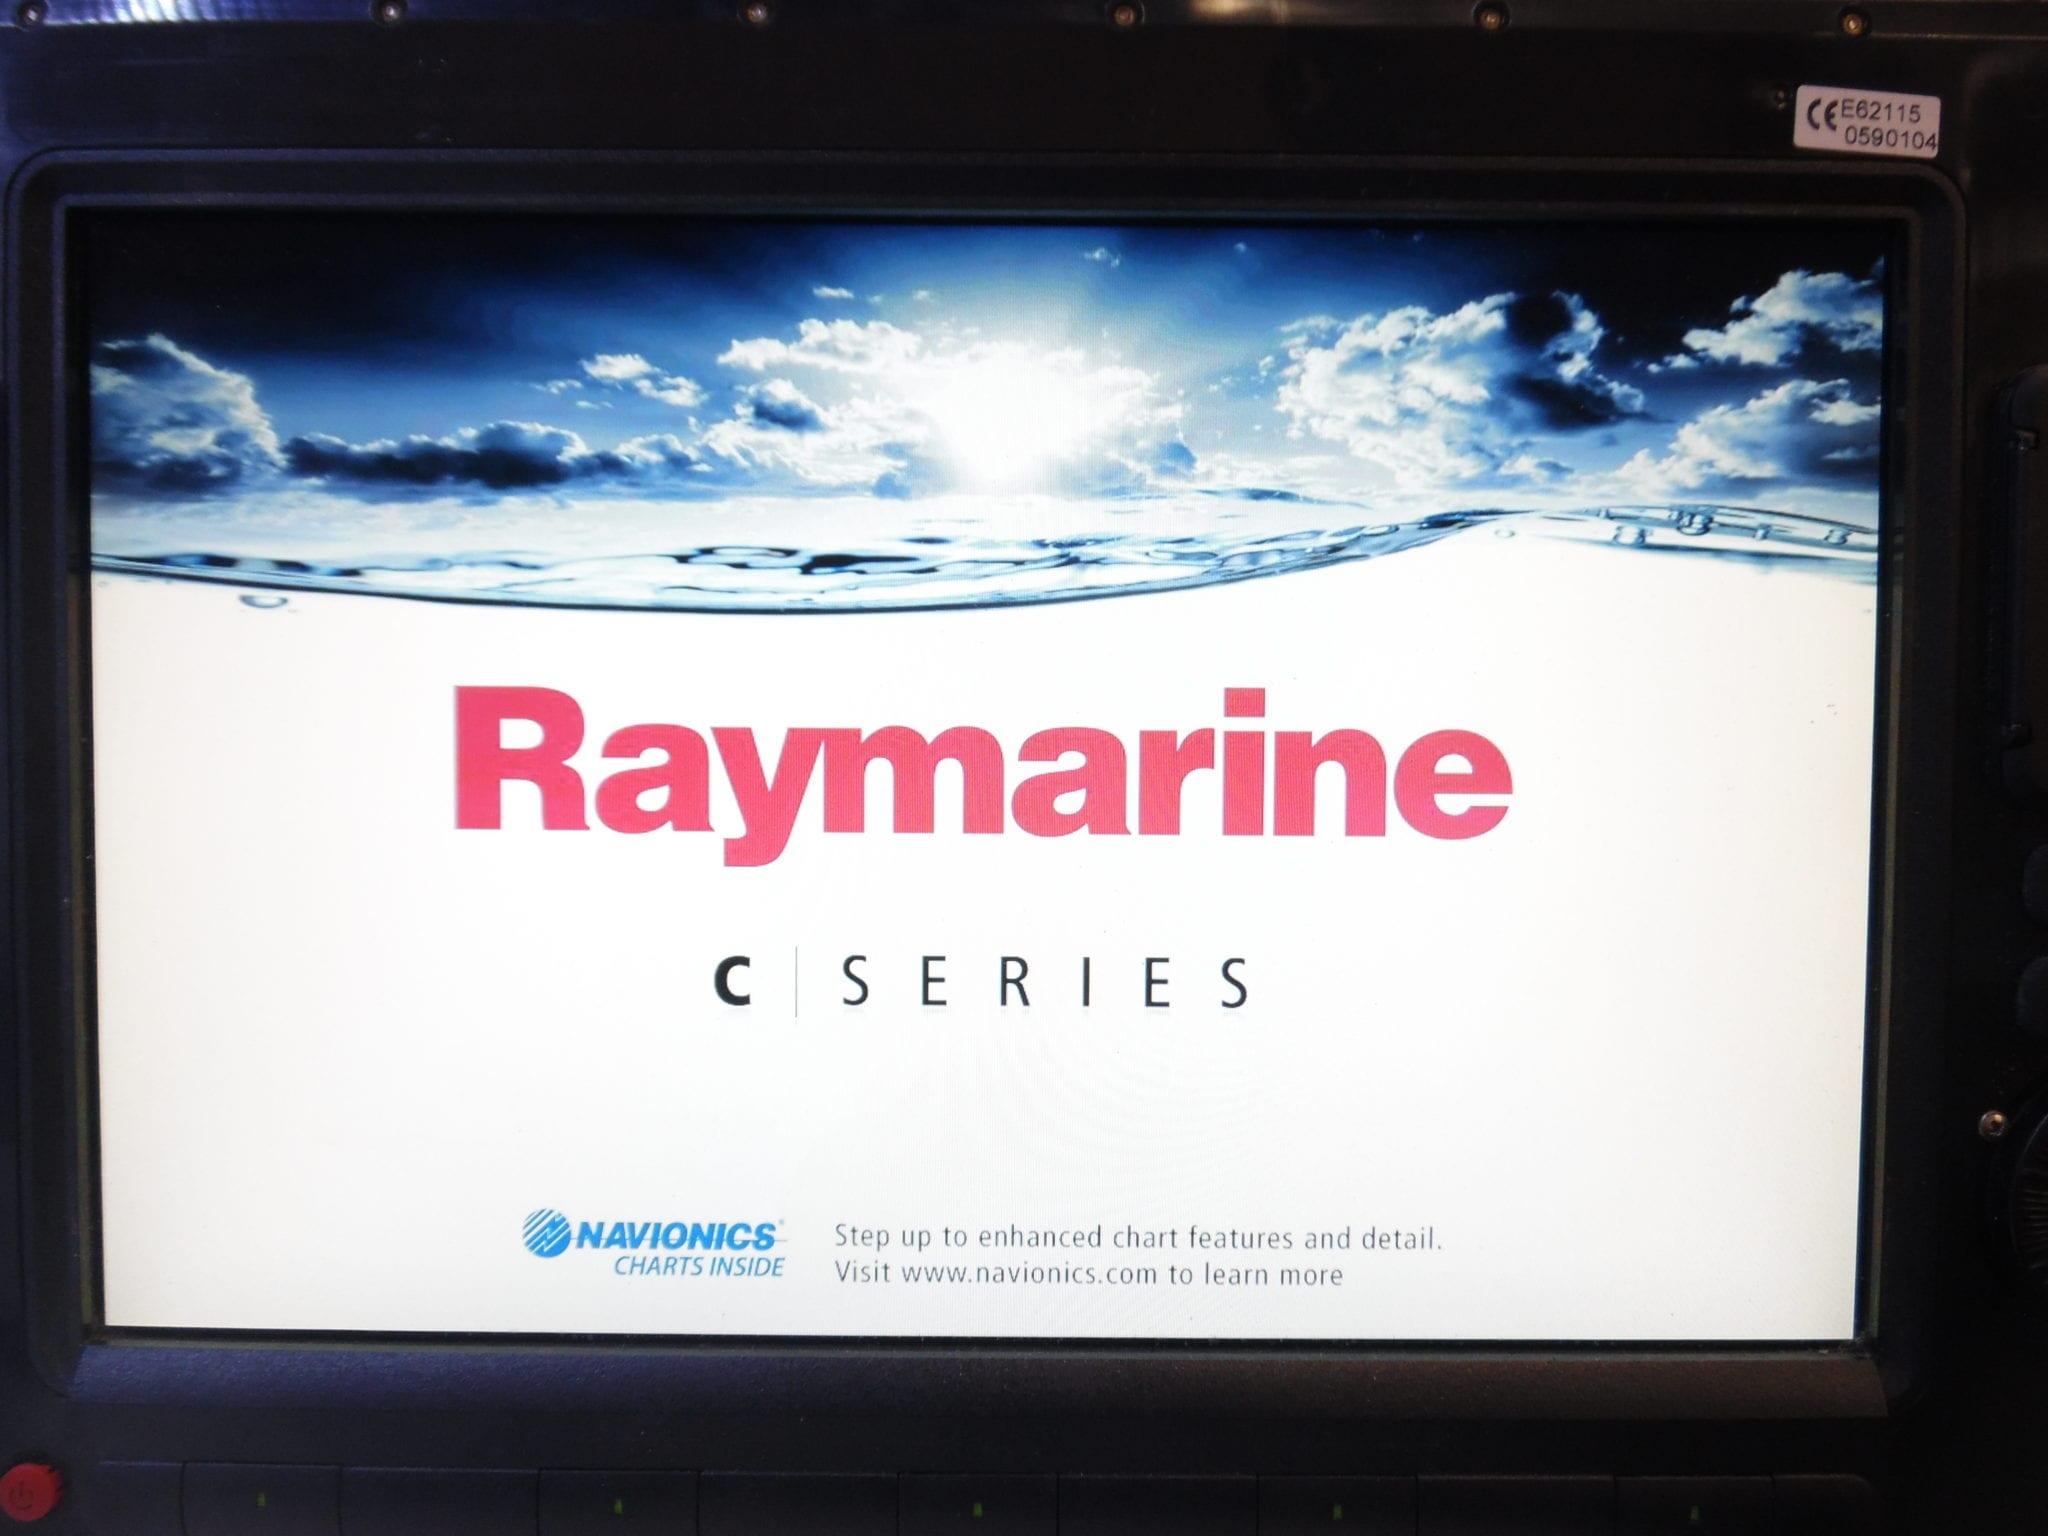 Raymarine C140w Us Coastal Maps Edition Internal Gps 14 Display Tested